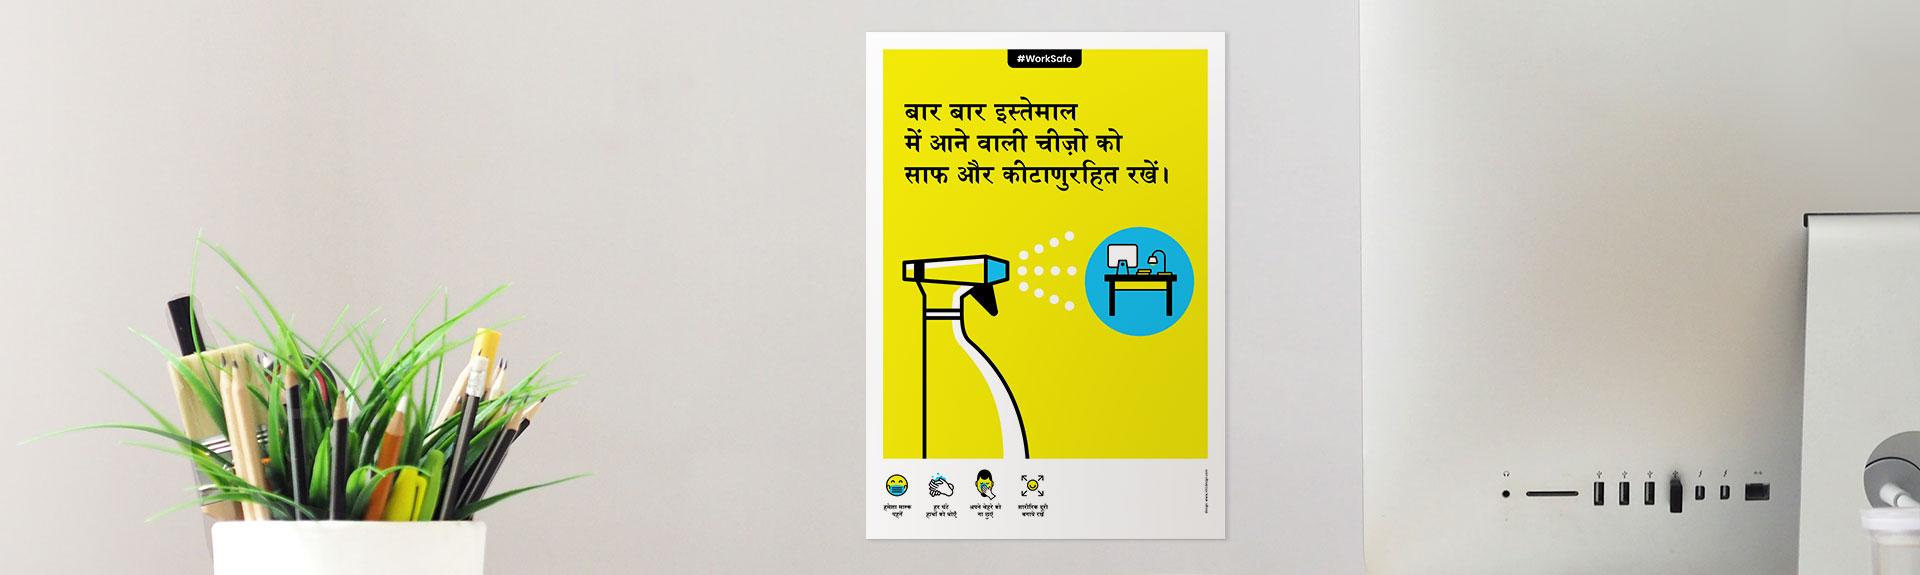 Disinfect-hindi_web-banner